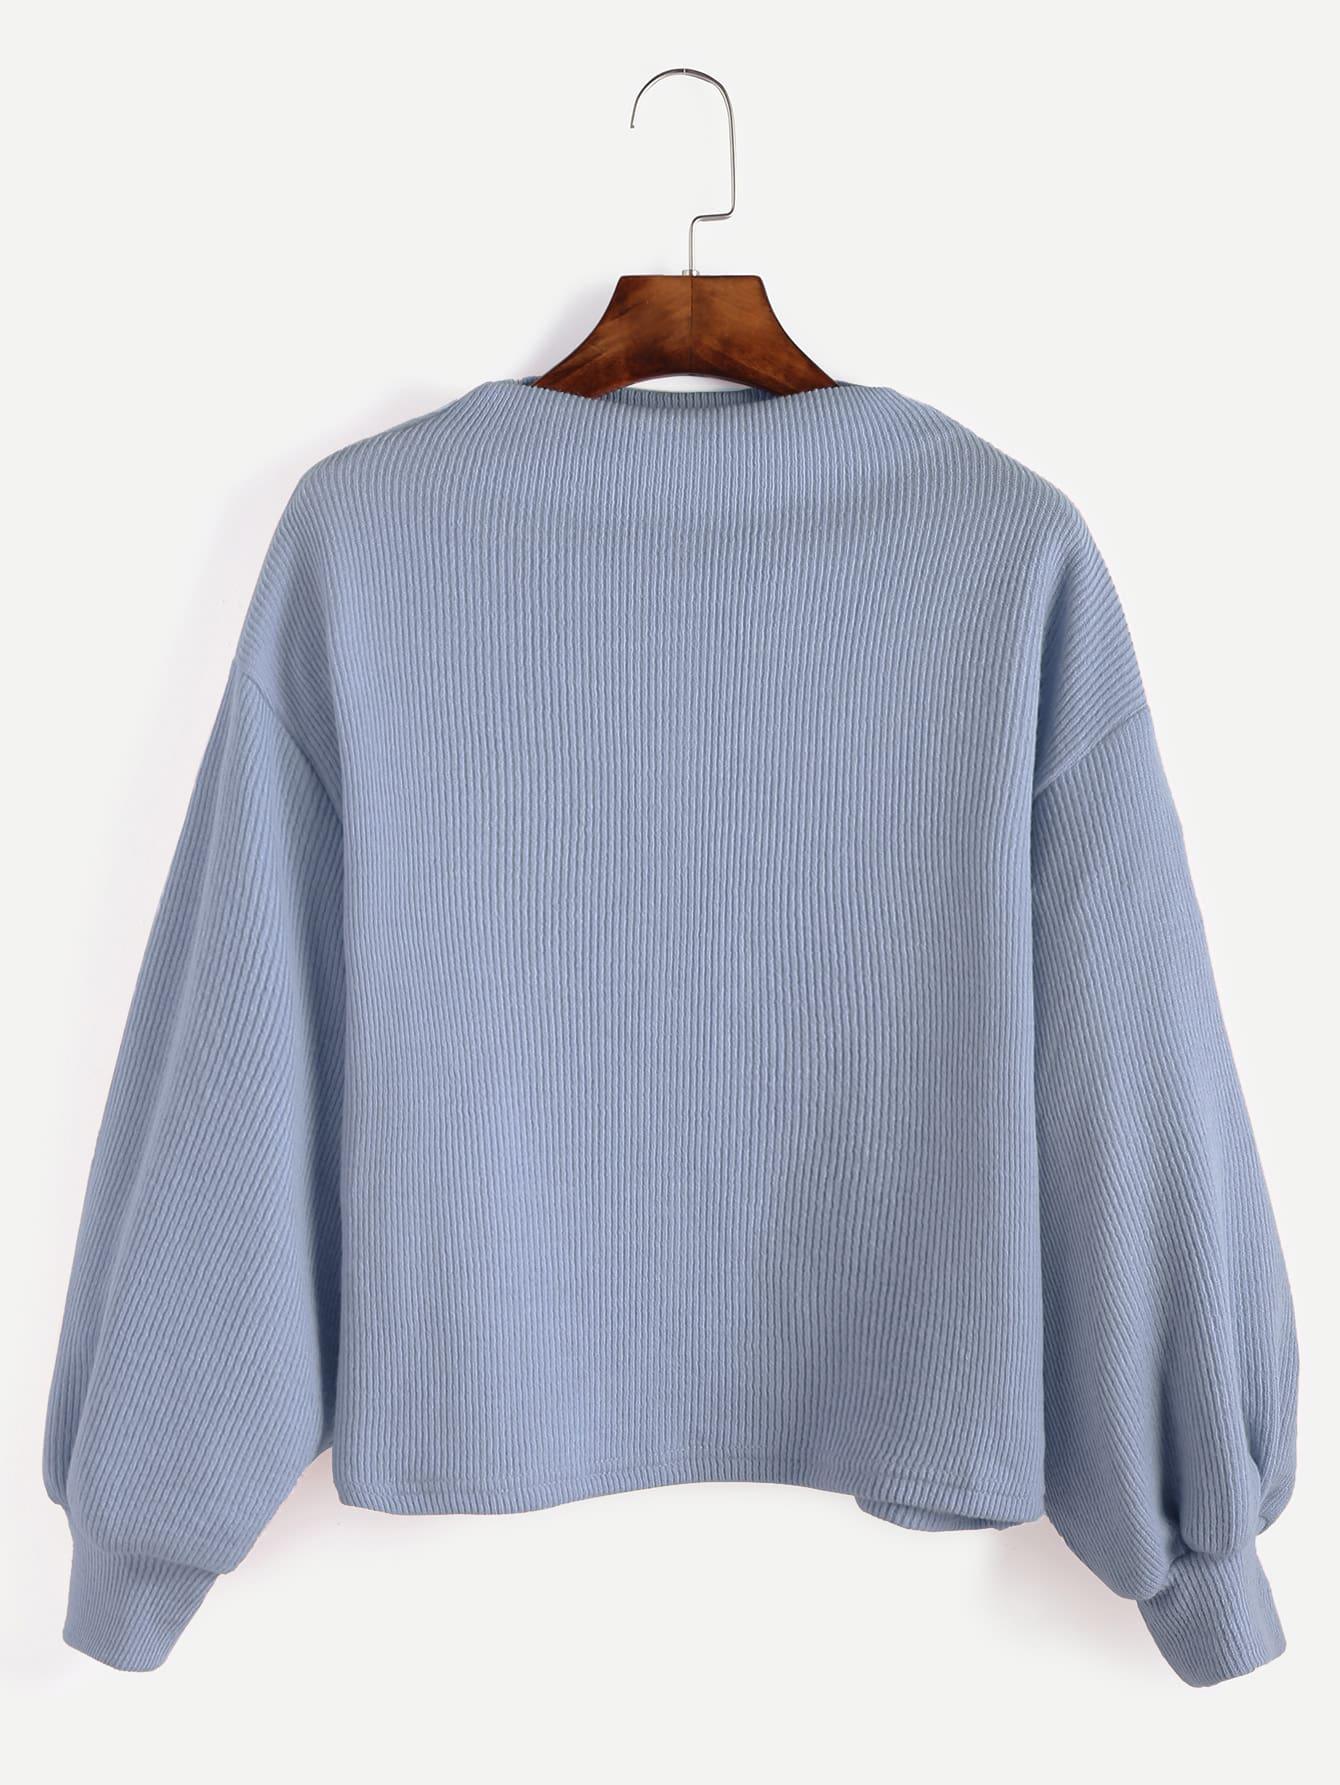 Blue Ribbed Lantern Sleeve Sweater sweater161014002